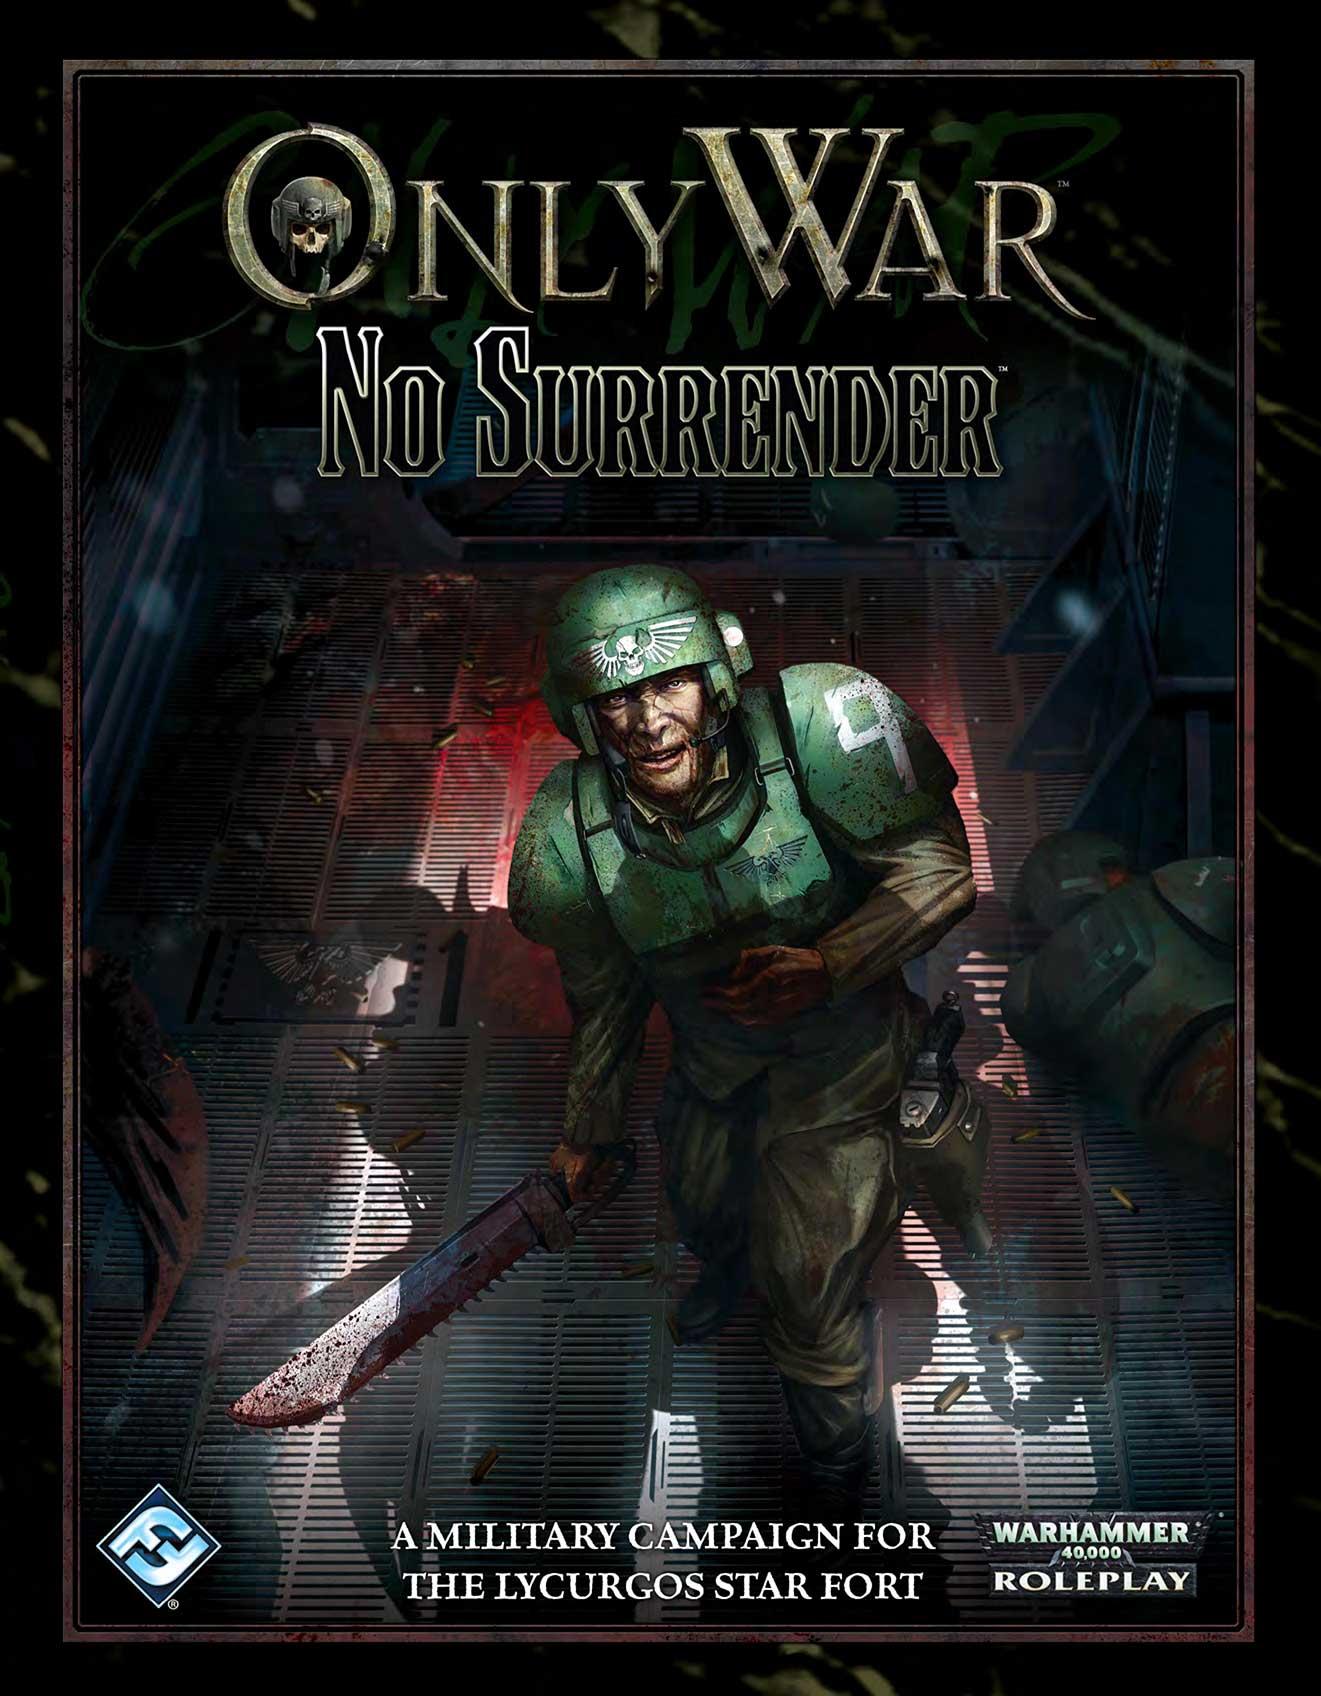 only war no surrender adventure 40k rpg tools